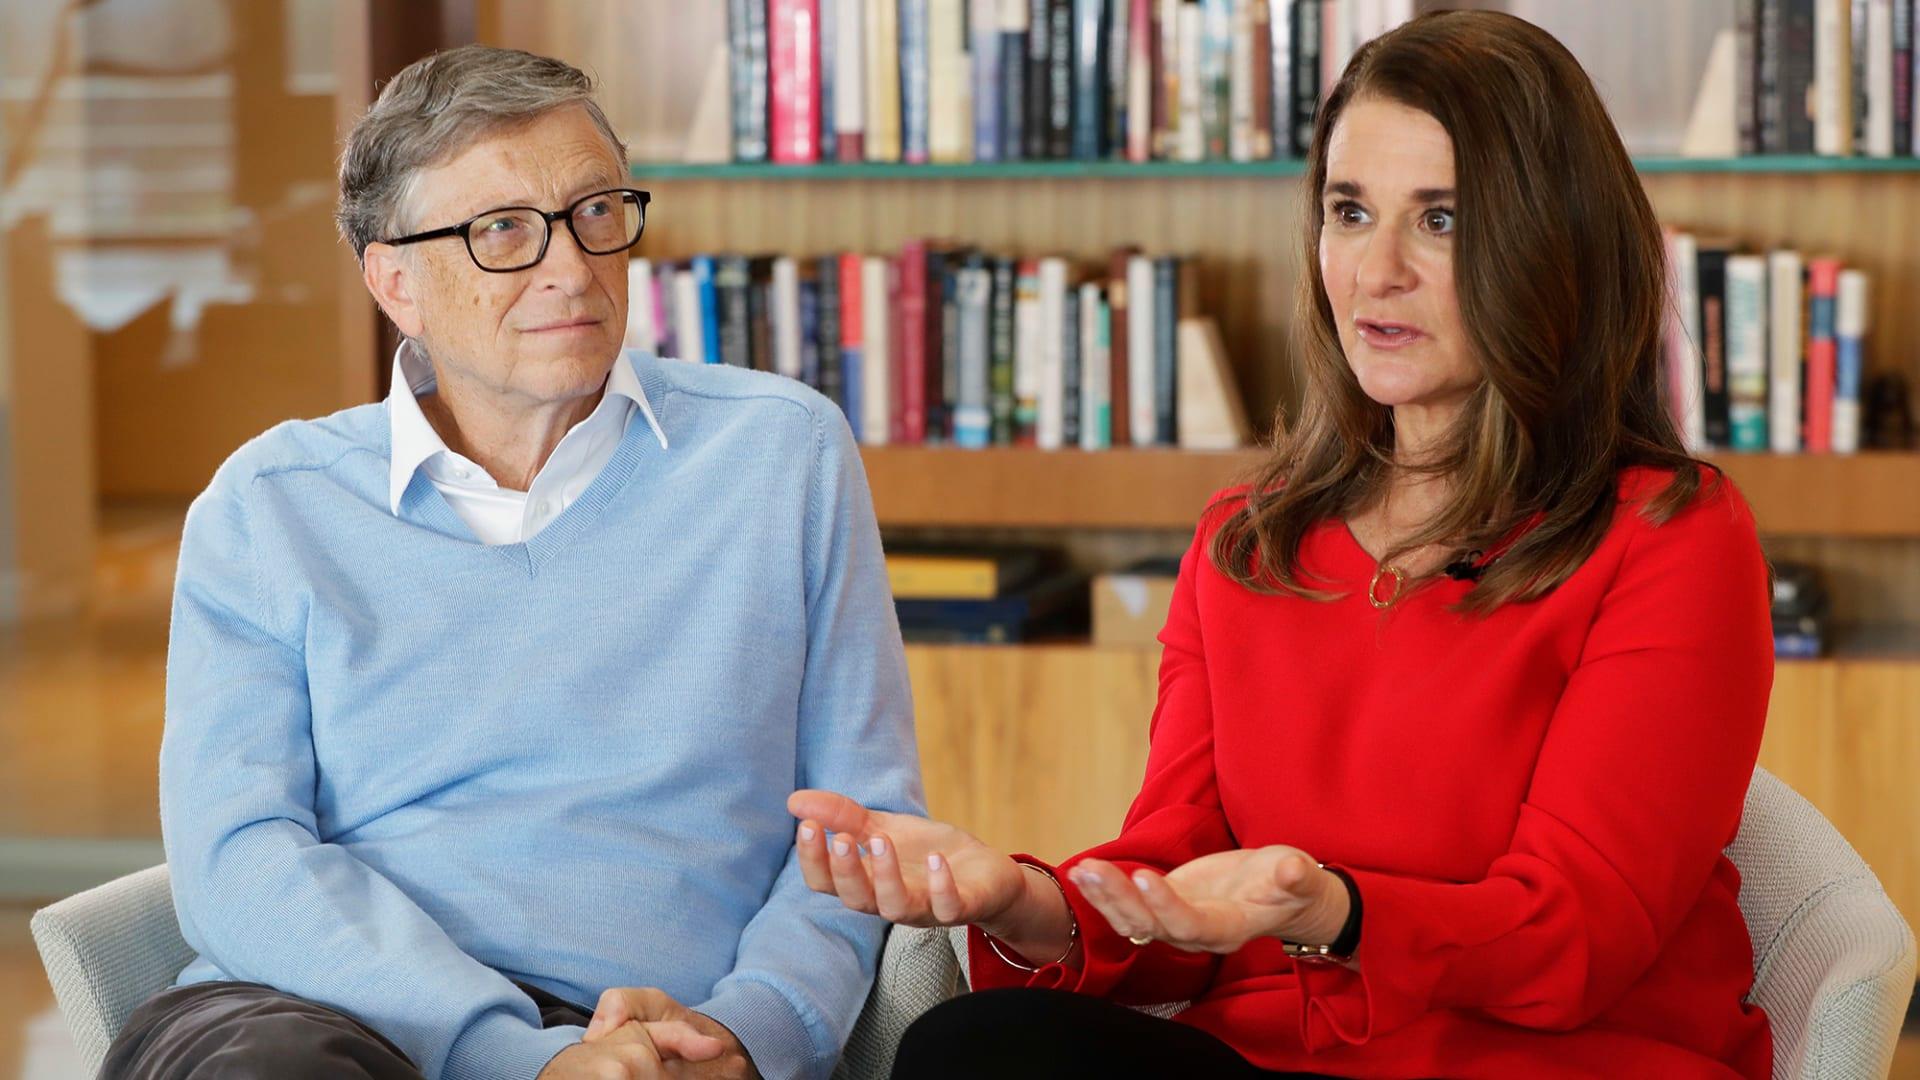 بيل وميليندا غيتس ينهيان معاملات طلاقهما